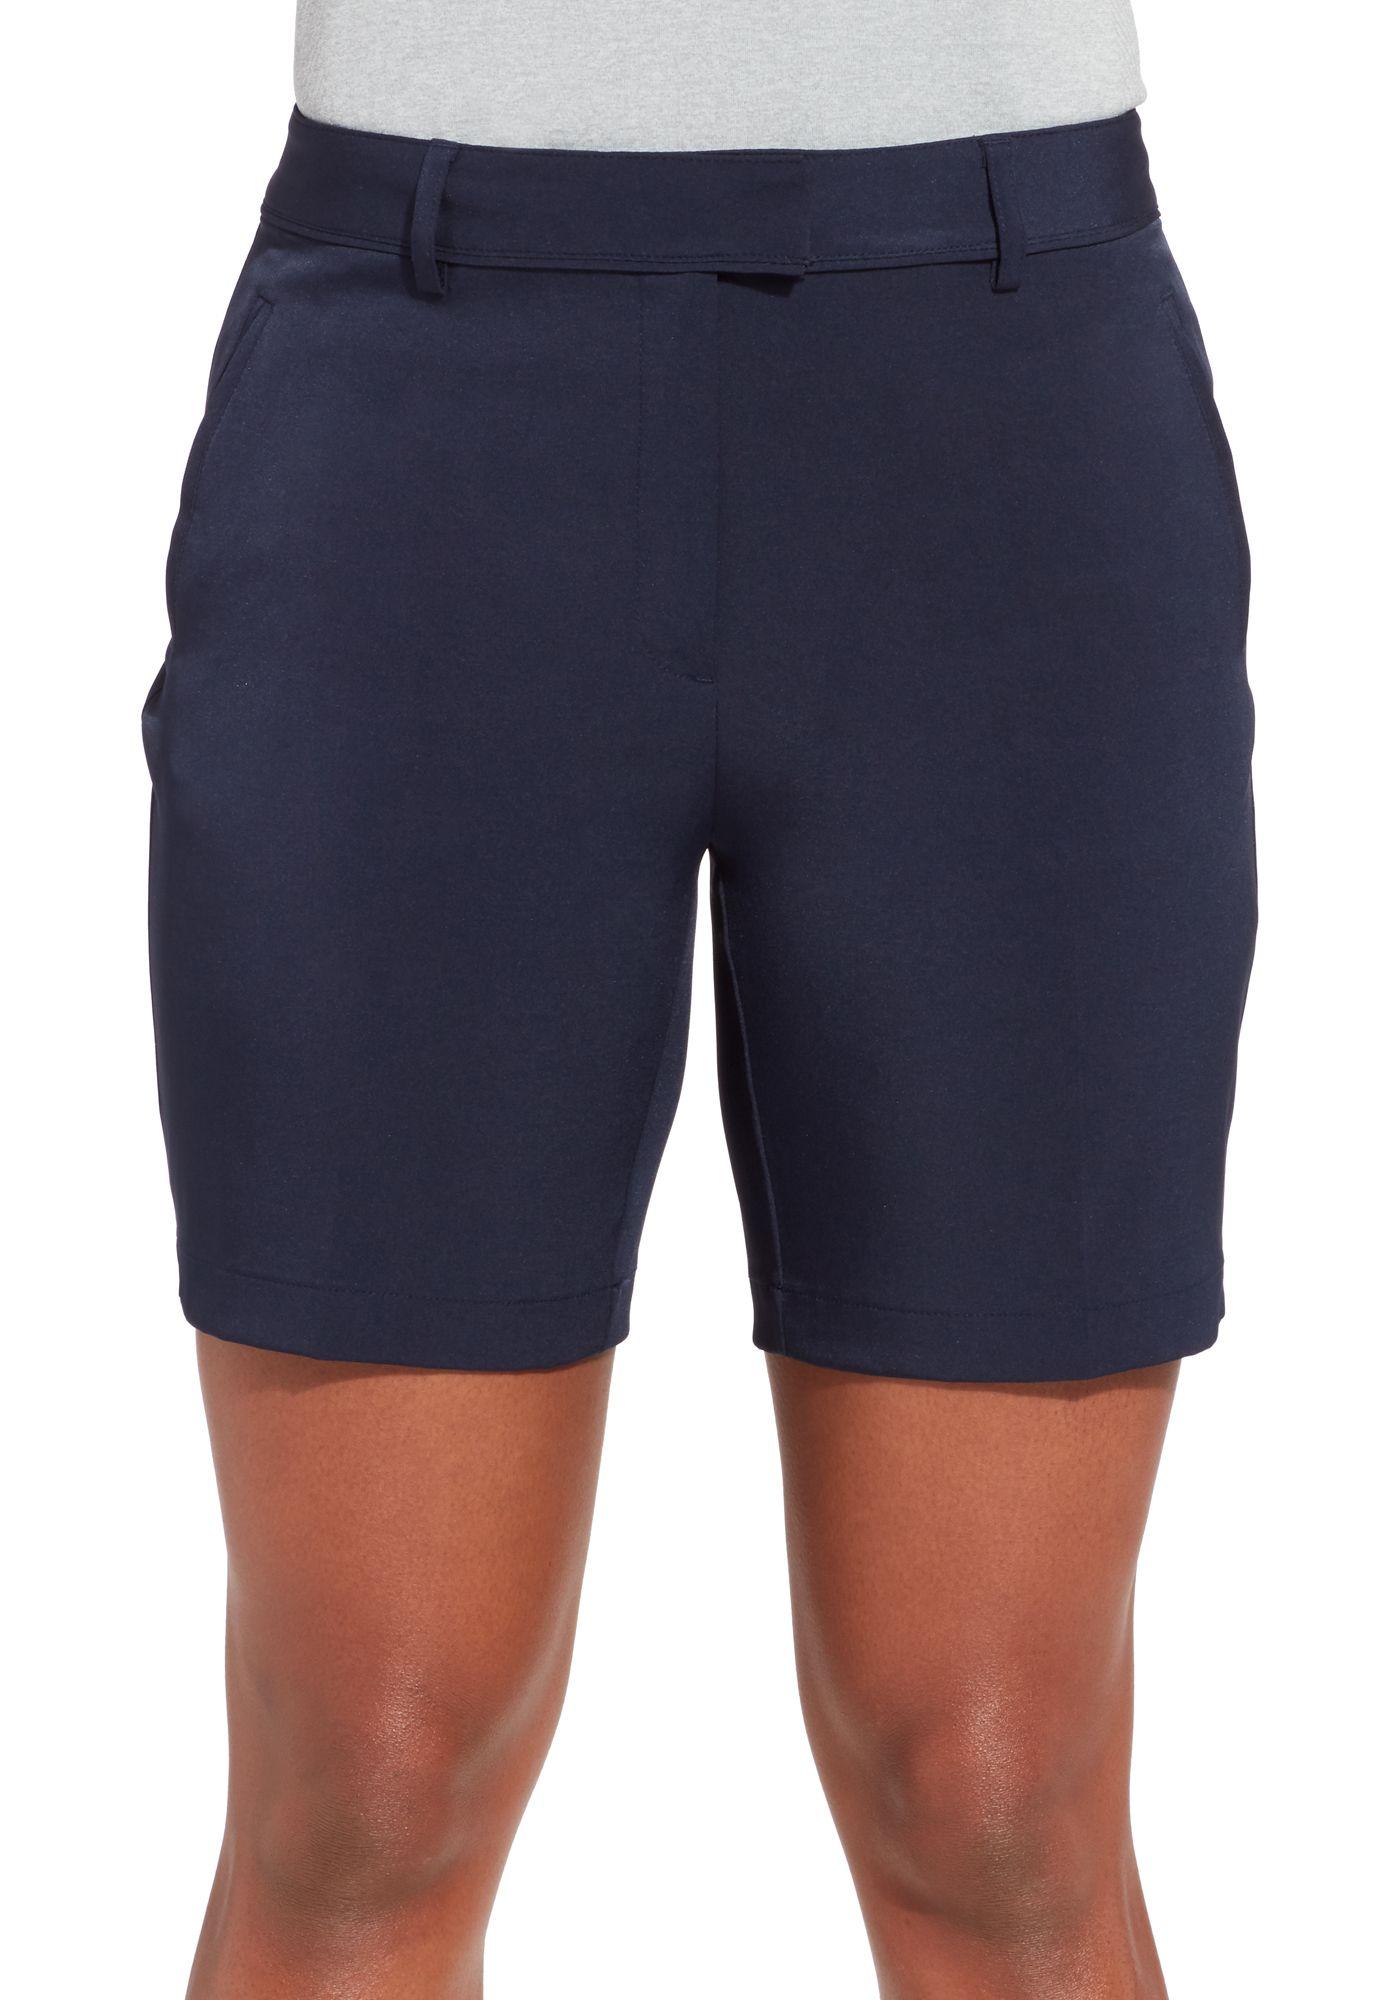 Lady Hagen Women's Essential Golf Shorts